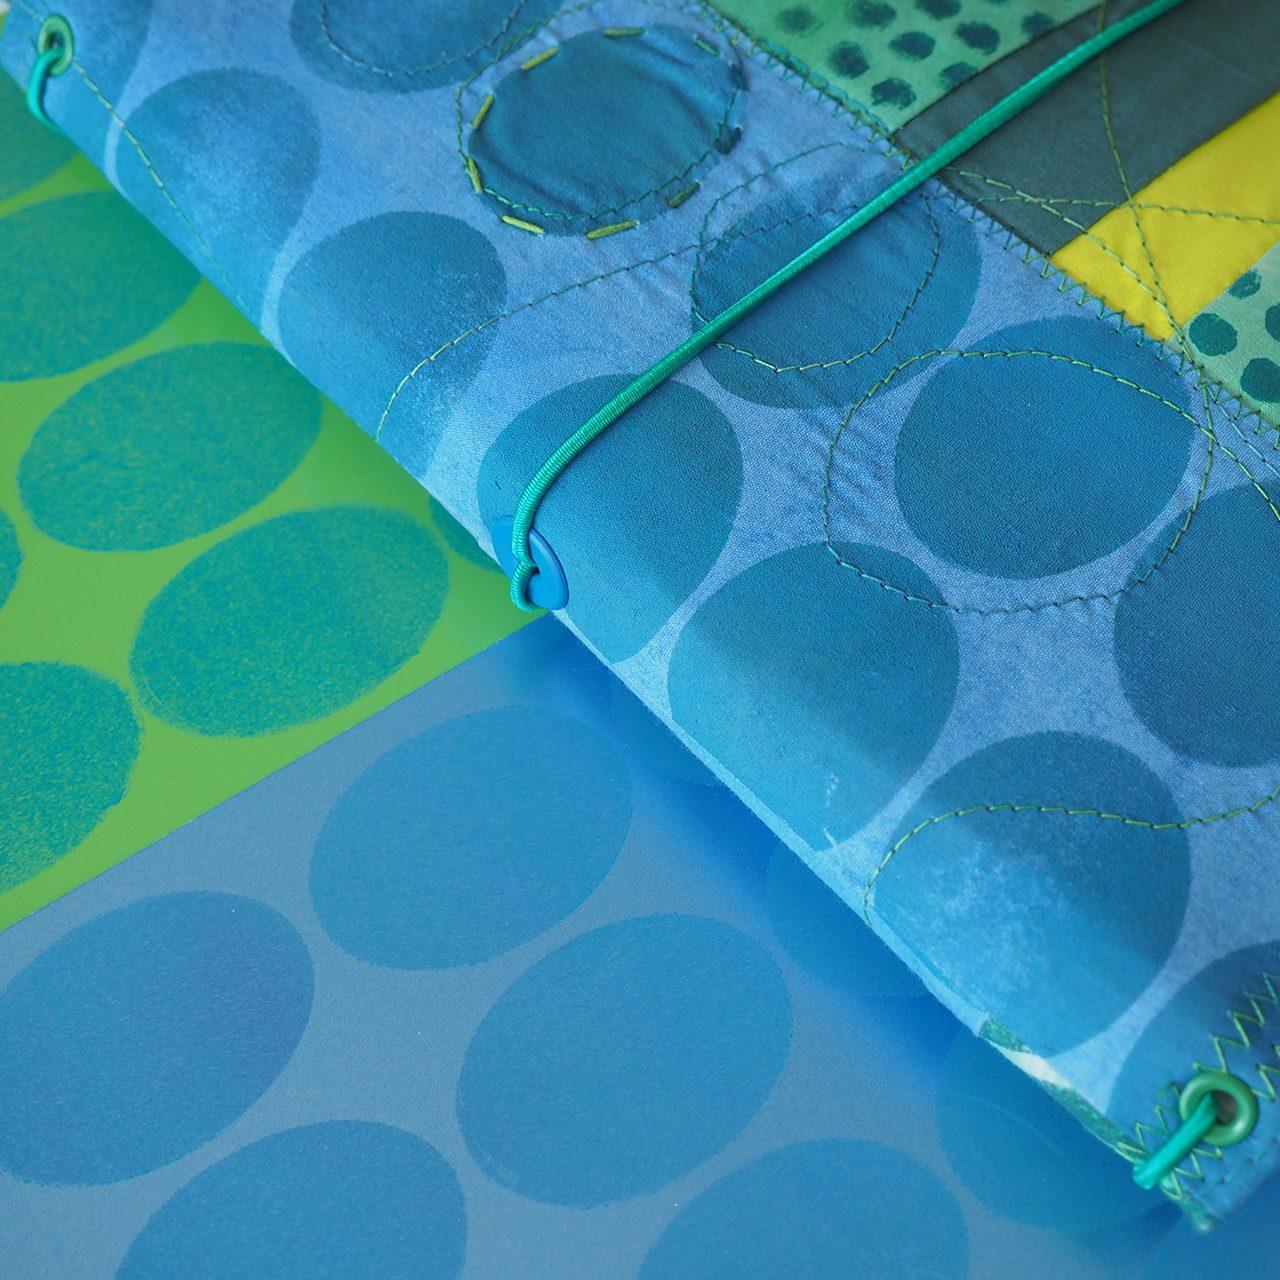 textiles Buch nach Müllerin ARt